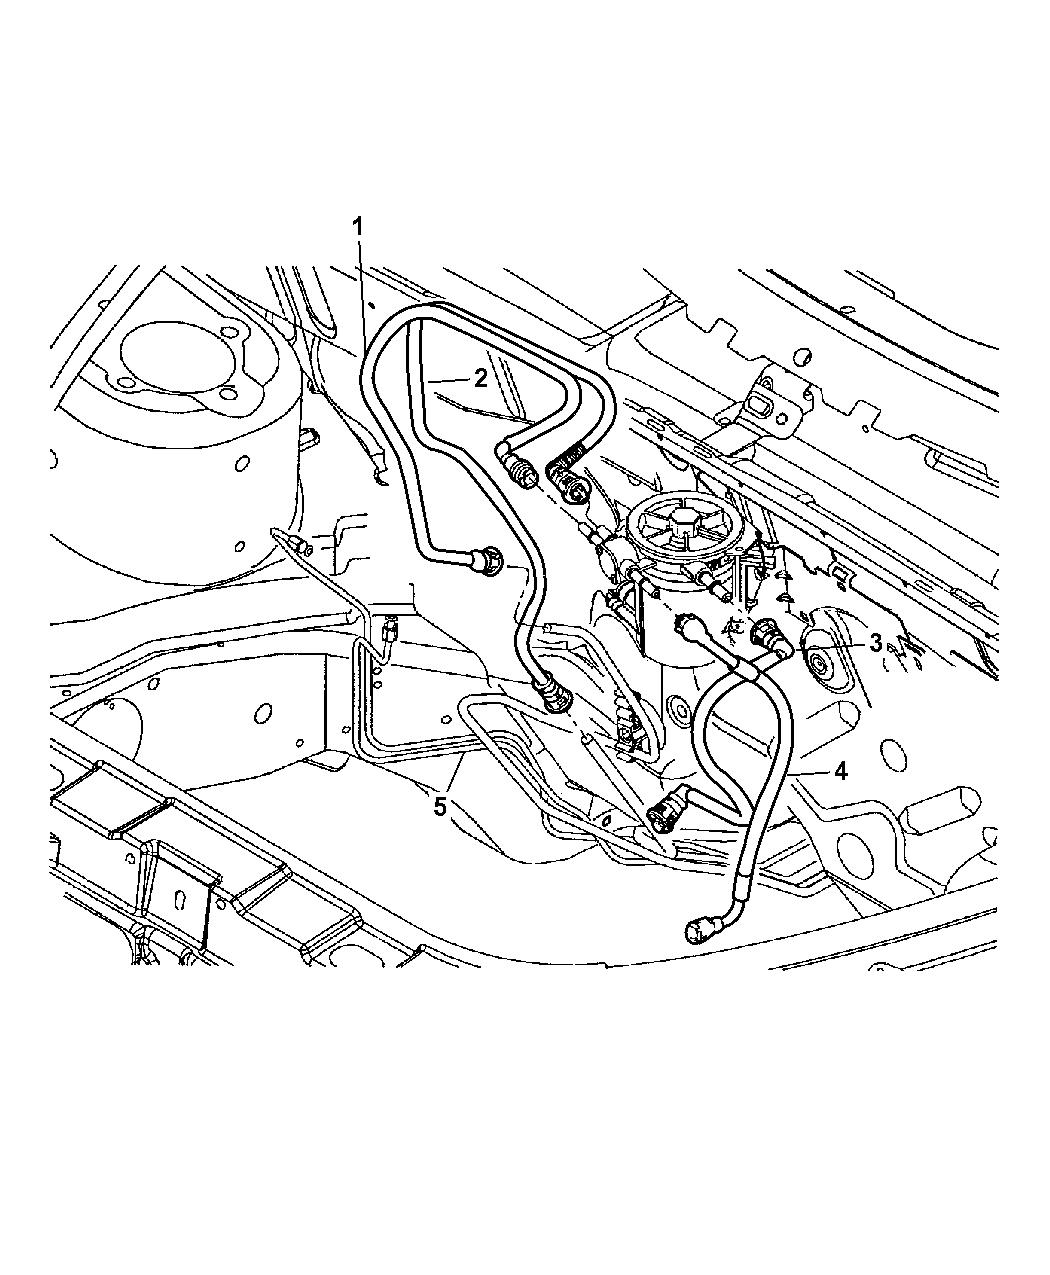 2004 Chrysler PT Cruiser Lines - Fuel Supply & Filter